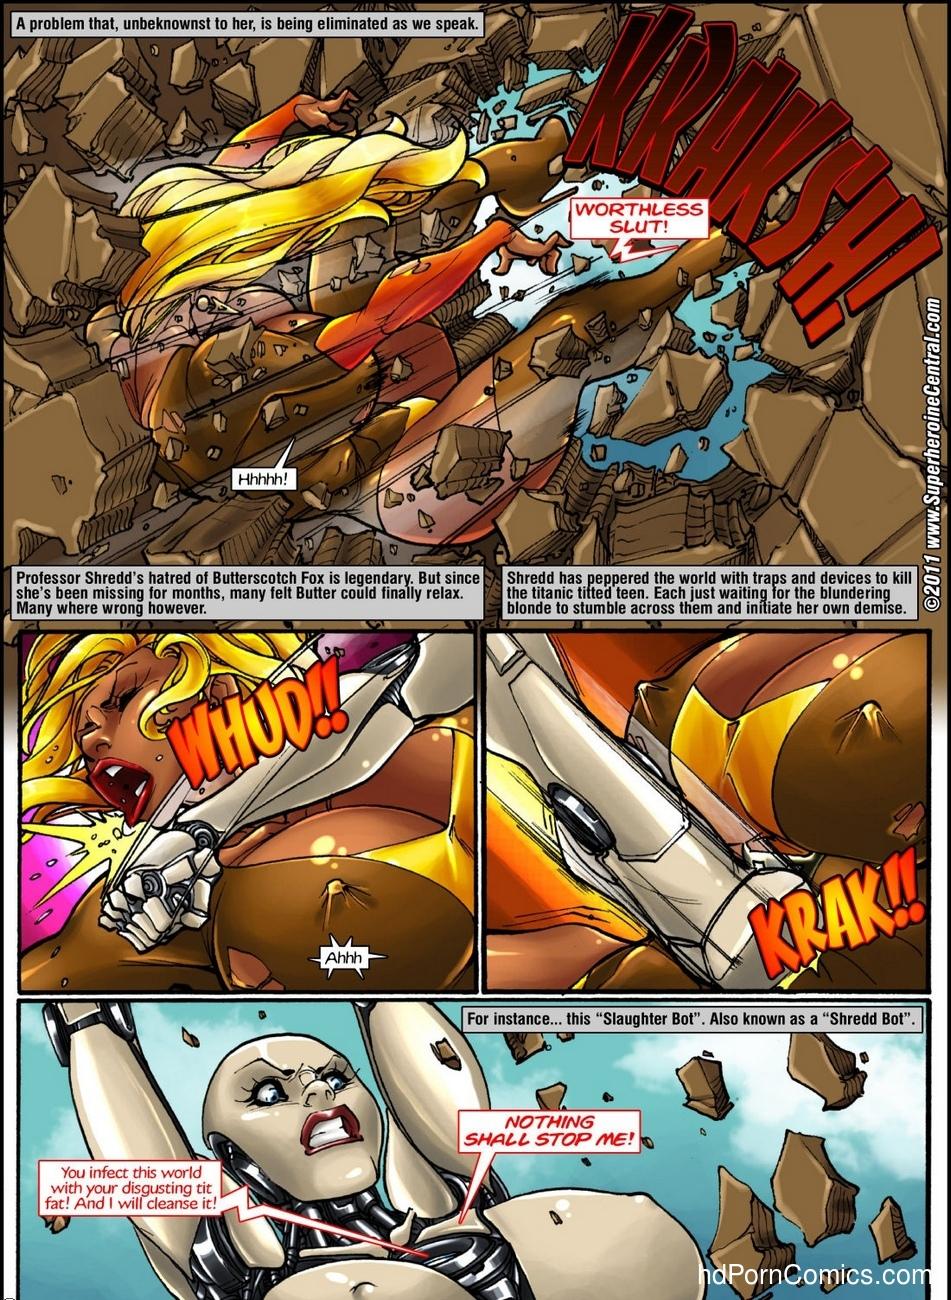 american angel 1 - smart weapon comic porn - hd porn comics